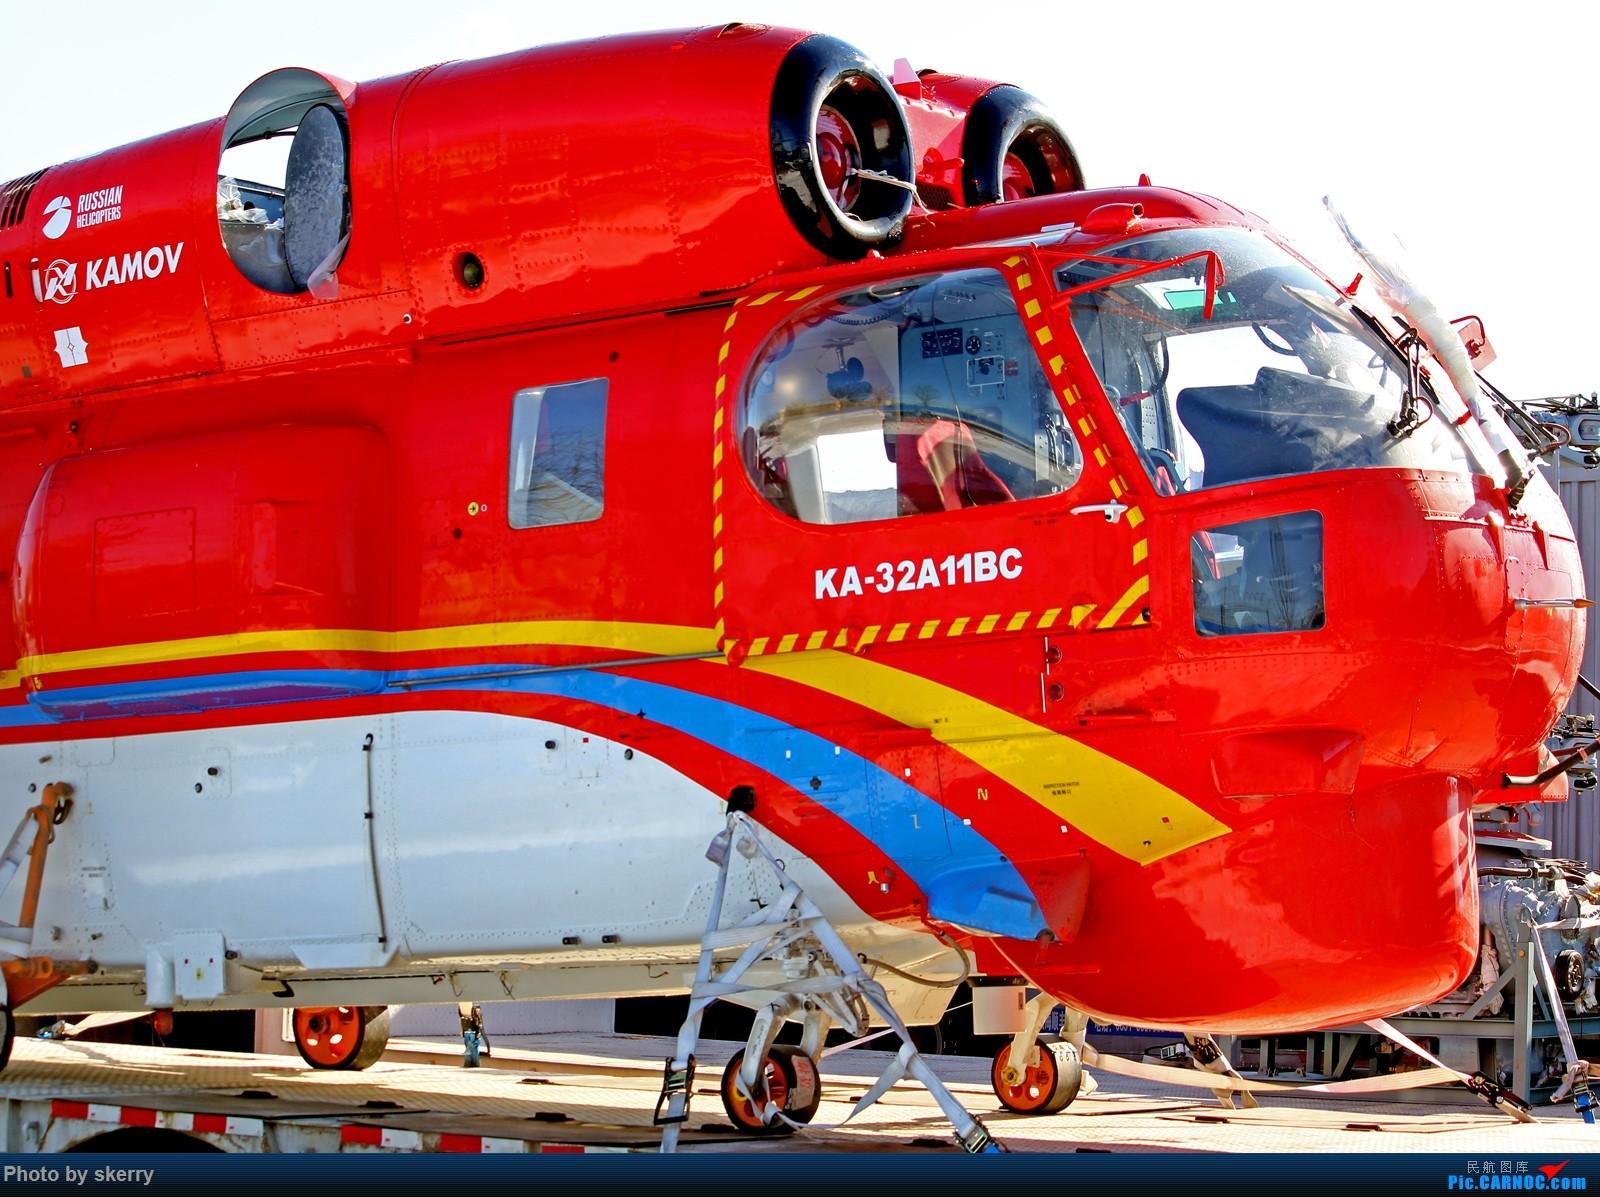 Re:[原创]***【TSN飞友会】双11海淘的终于到货了-KA-32A11BC**** KA-32  天津滨海国际机场